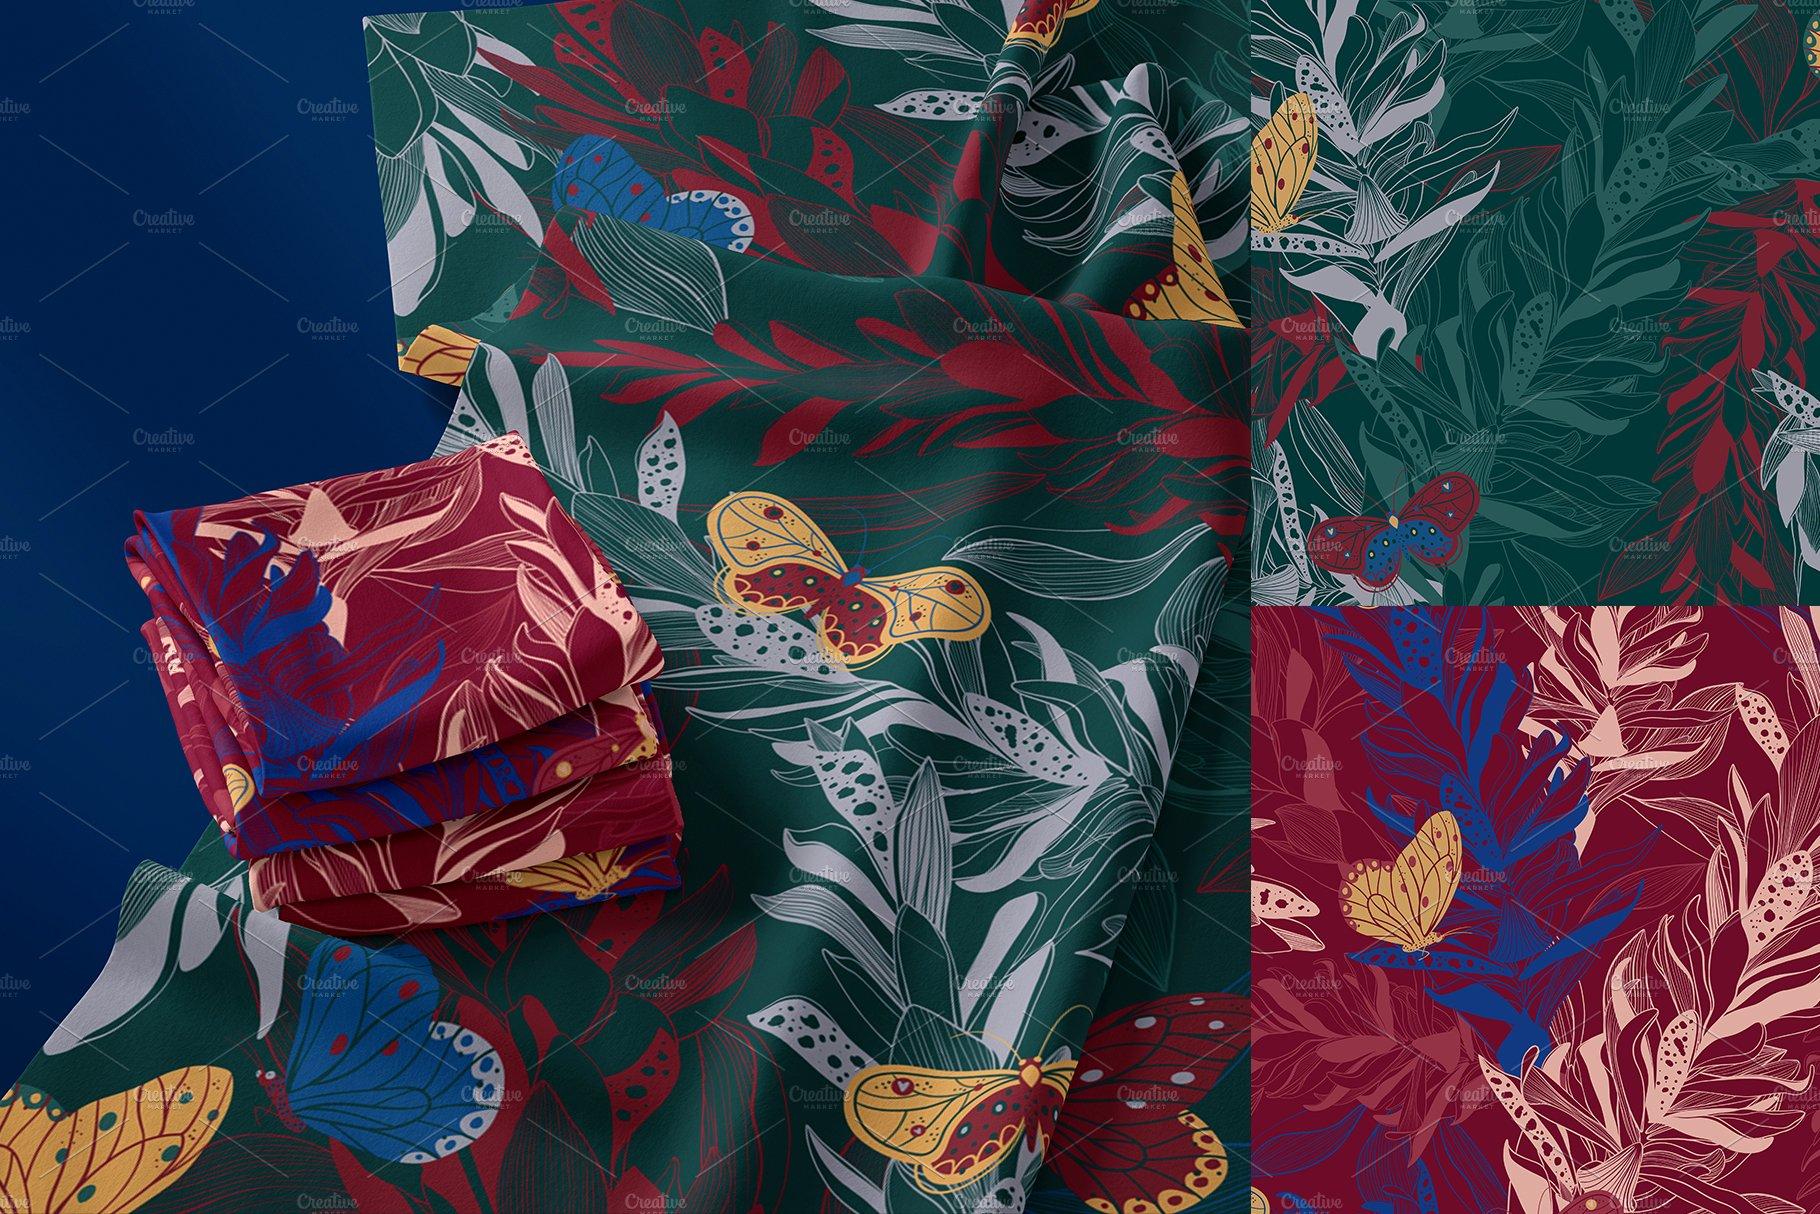 24 02 20 ginger flower creative market 0005 grupa 25 kopia 5